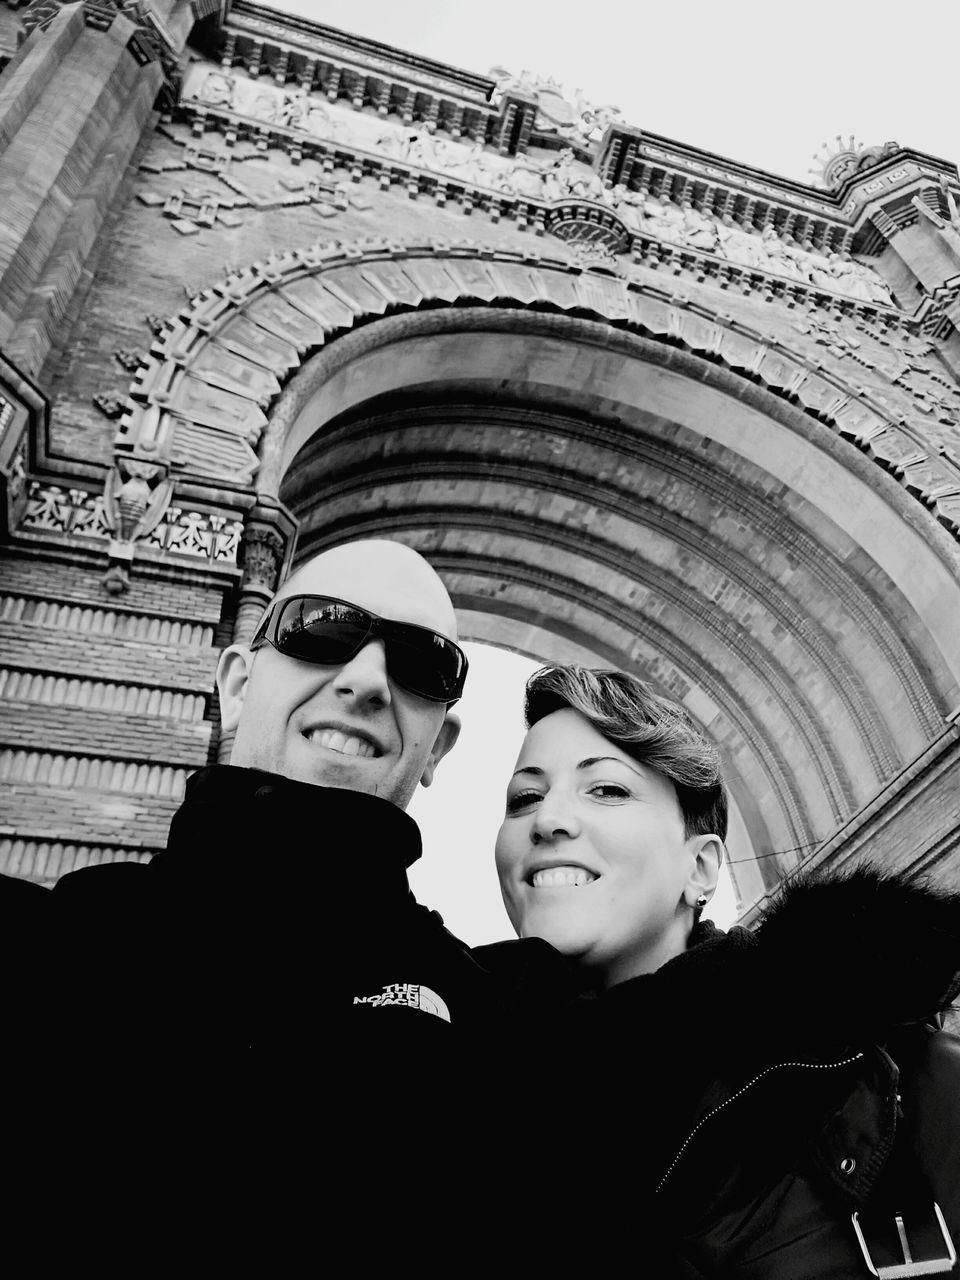 Portrait Of Couple Standing Against Arc De Triomf